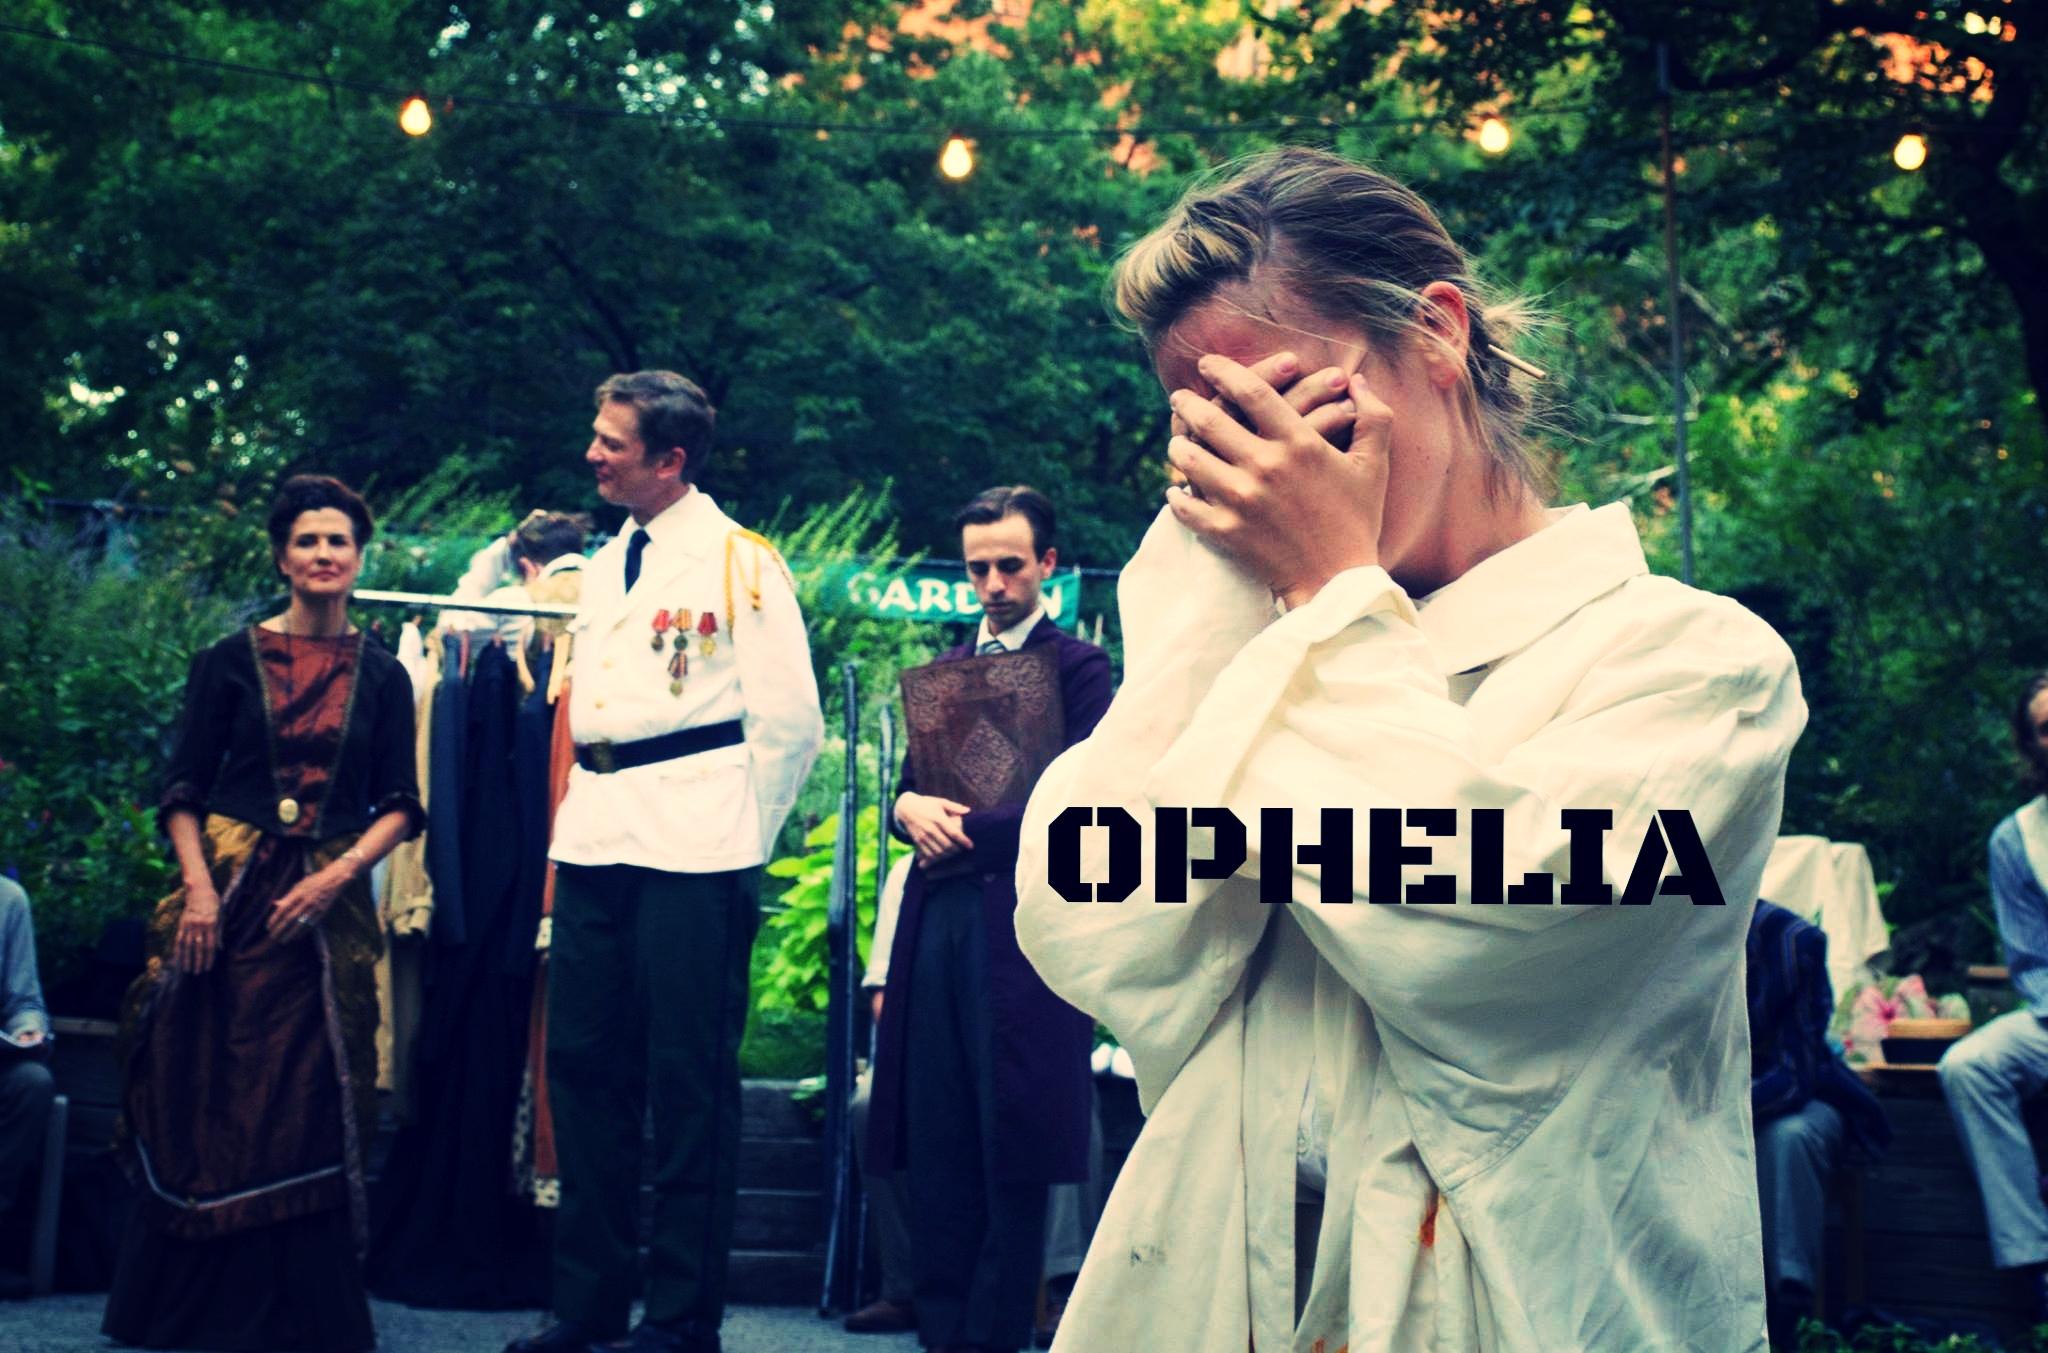 ophelia and hands.jpg